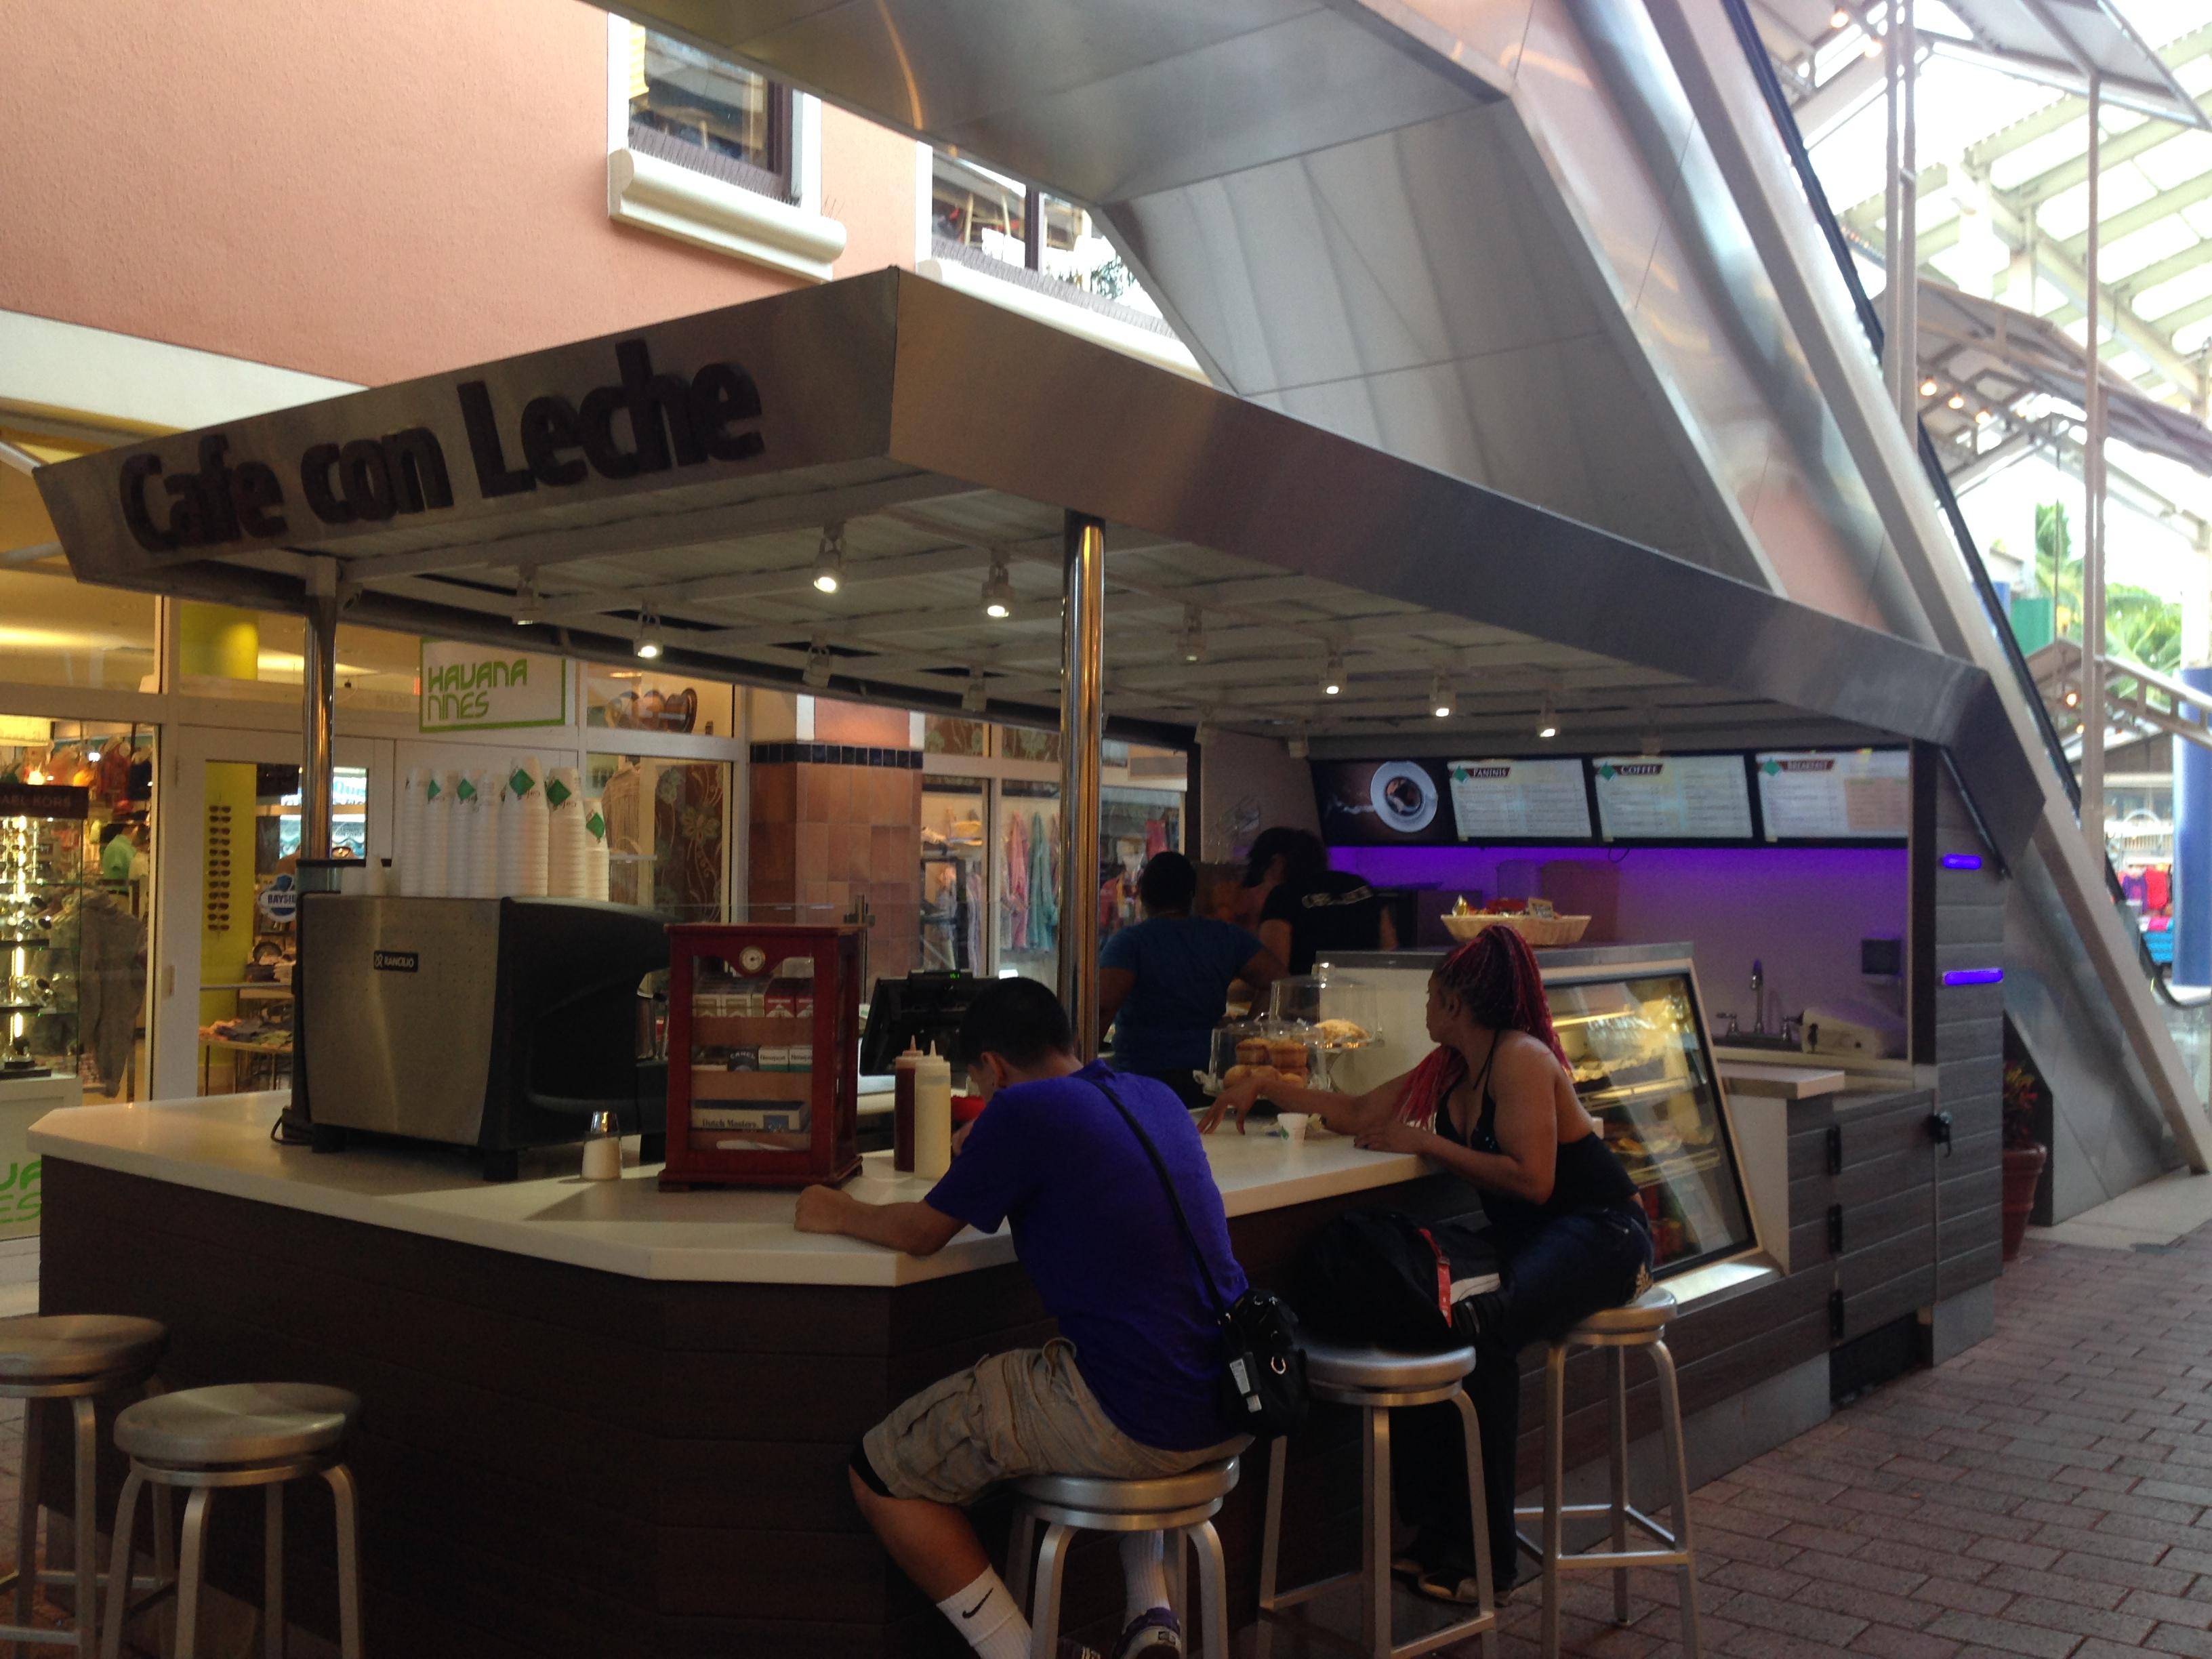 Cafe con Leche, Bayside